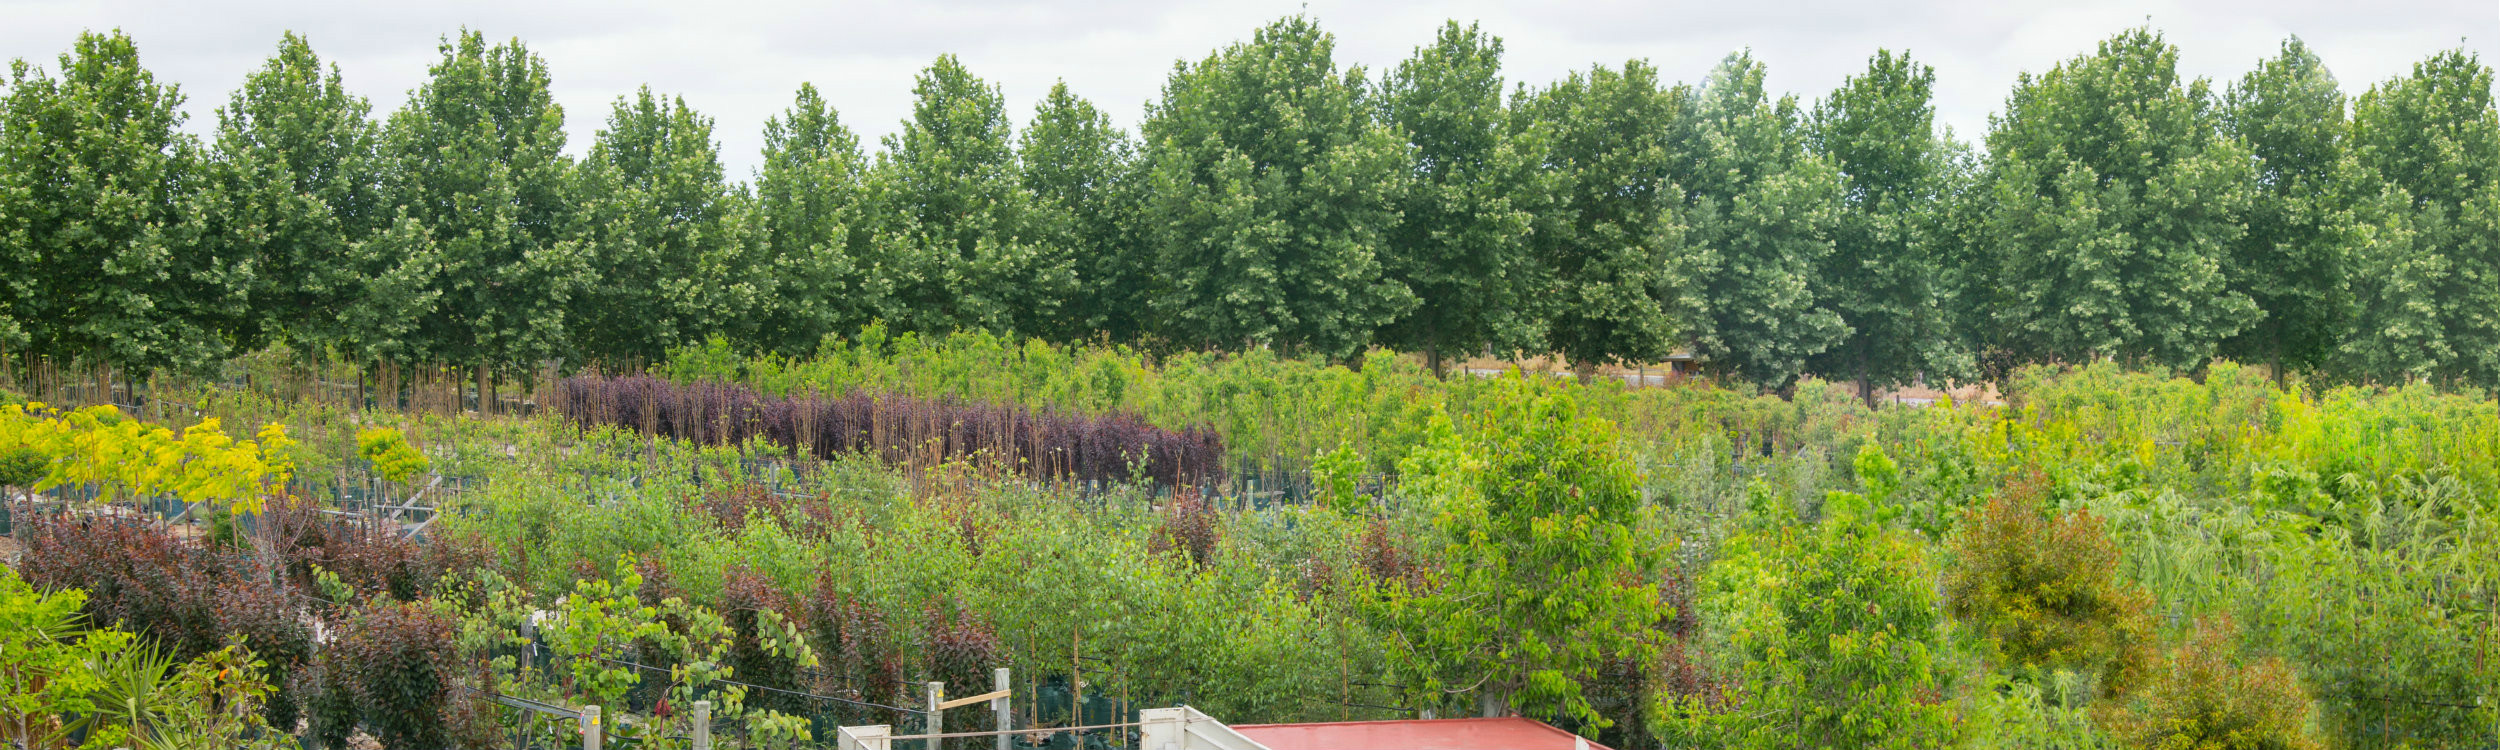 Arborwesttreefarm14